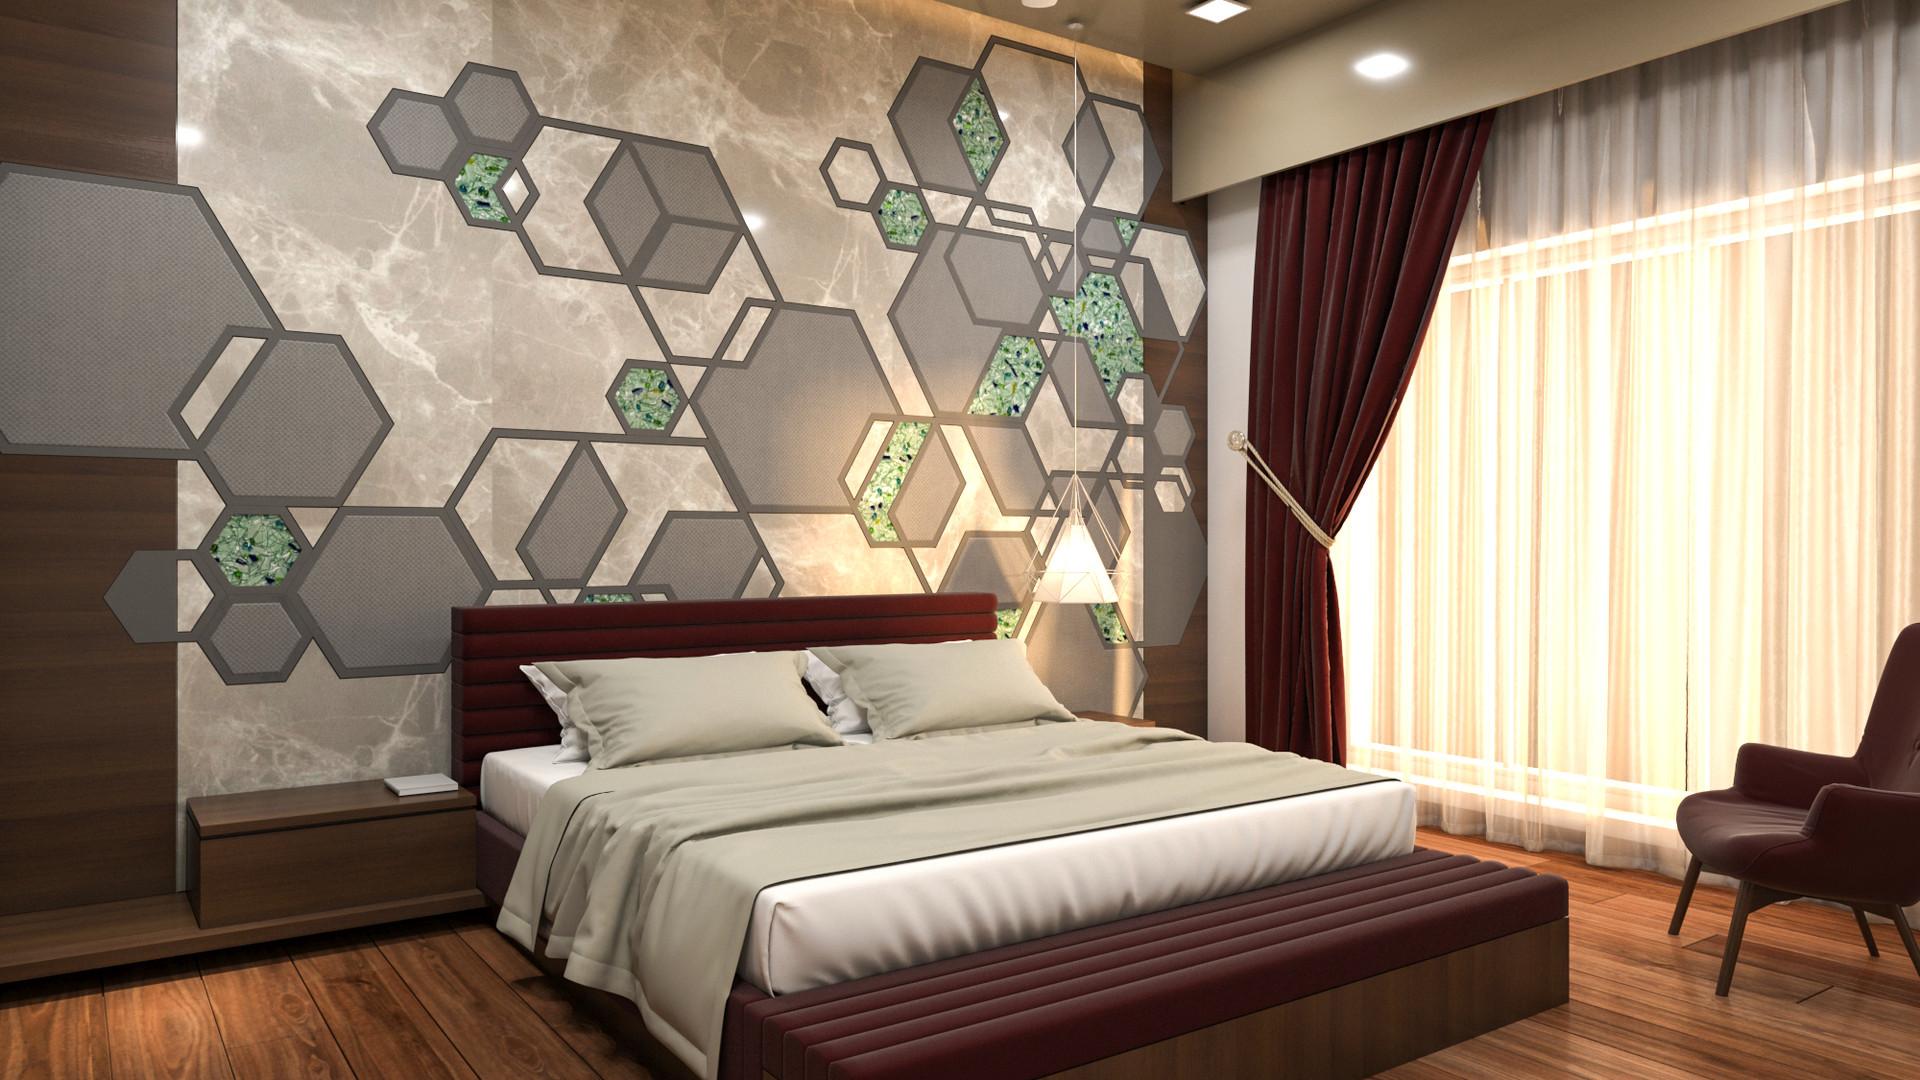 son room v2 op3.jpg